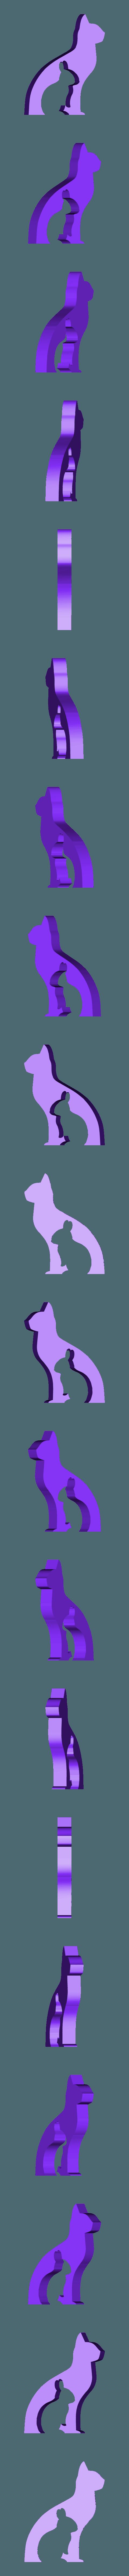 hund_katz_hase_maus_k.STL Download free STL file Animal Silhouette - Dog Cat Rabbit Mouse • 3D printing template, jtronics